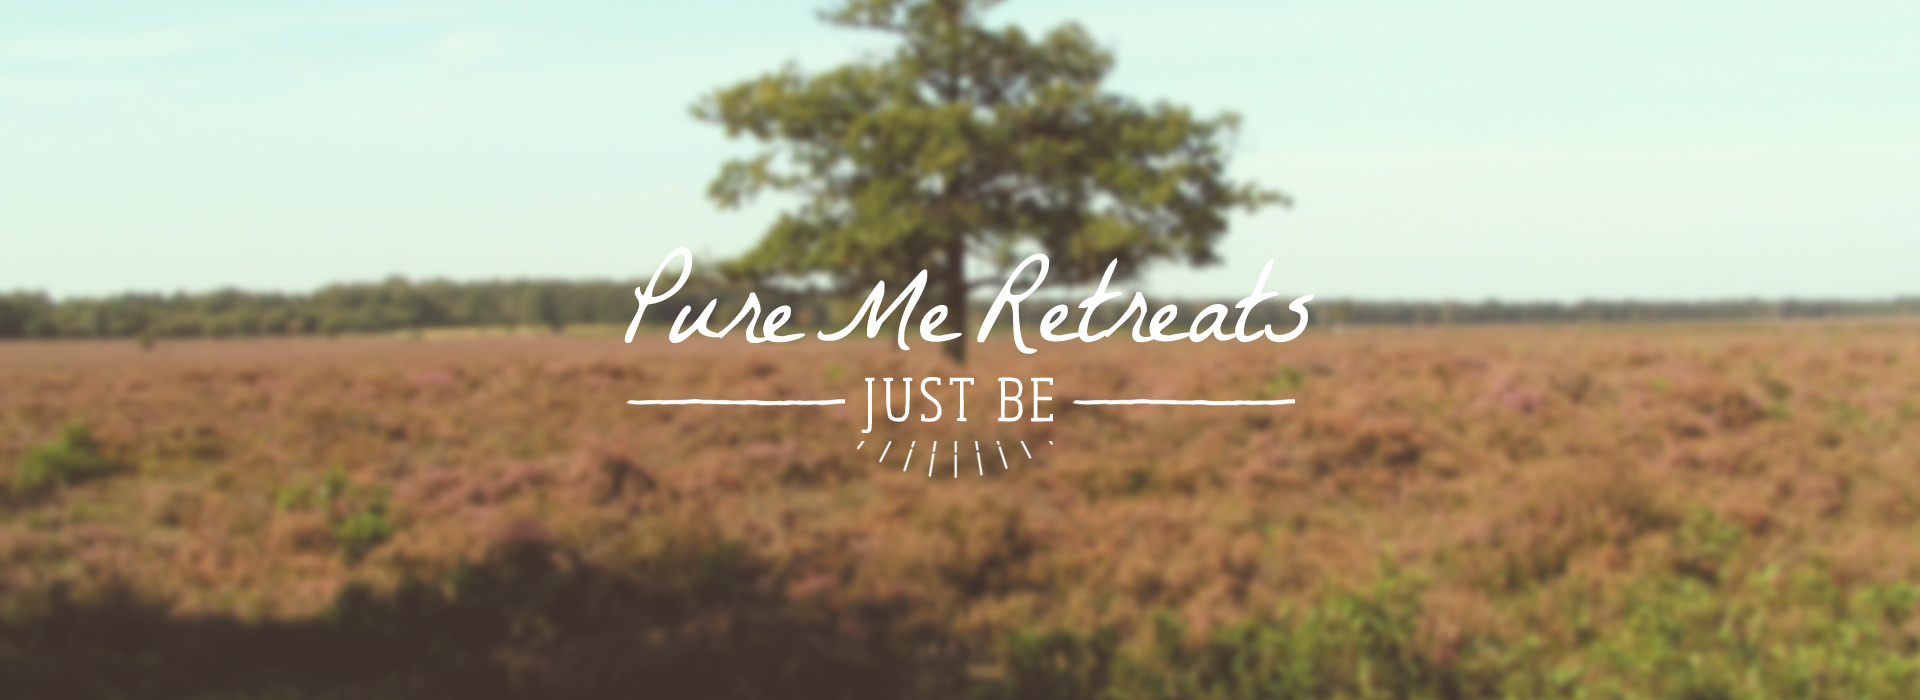 Pure-Me-Retreats-slider4